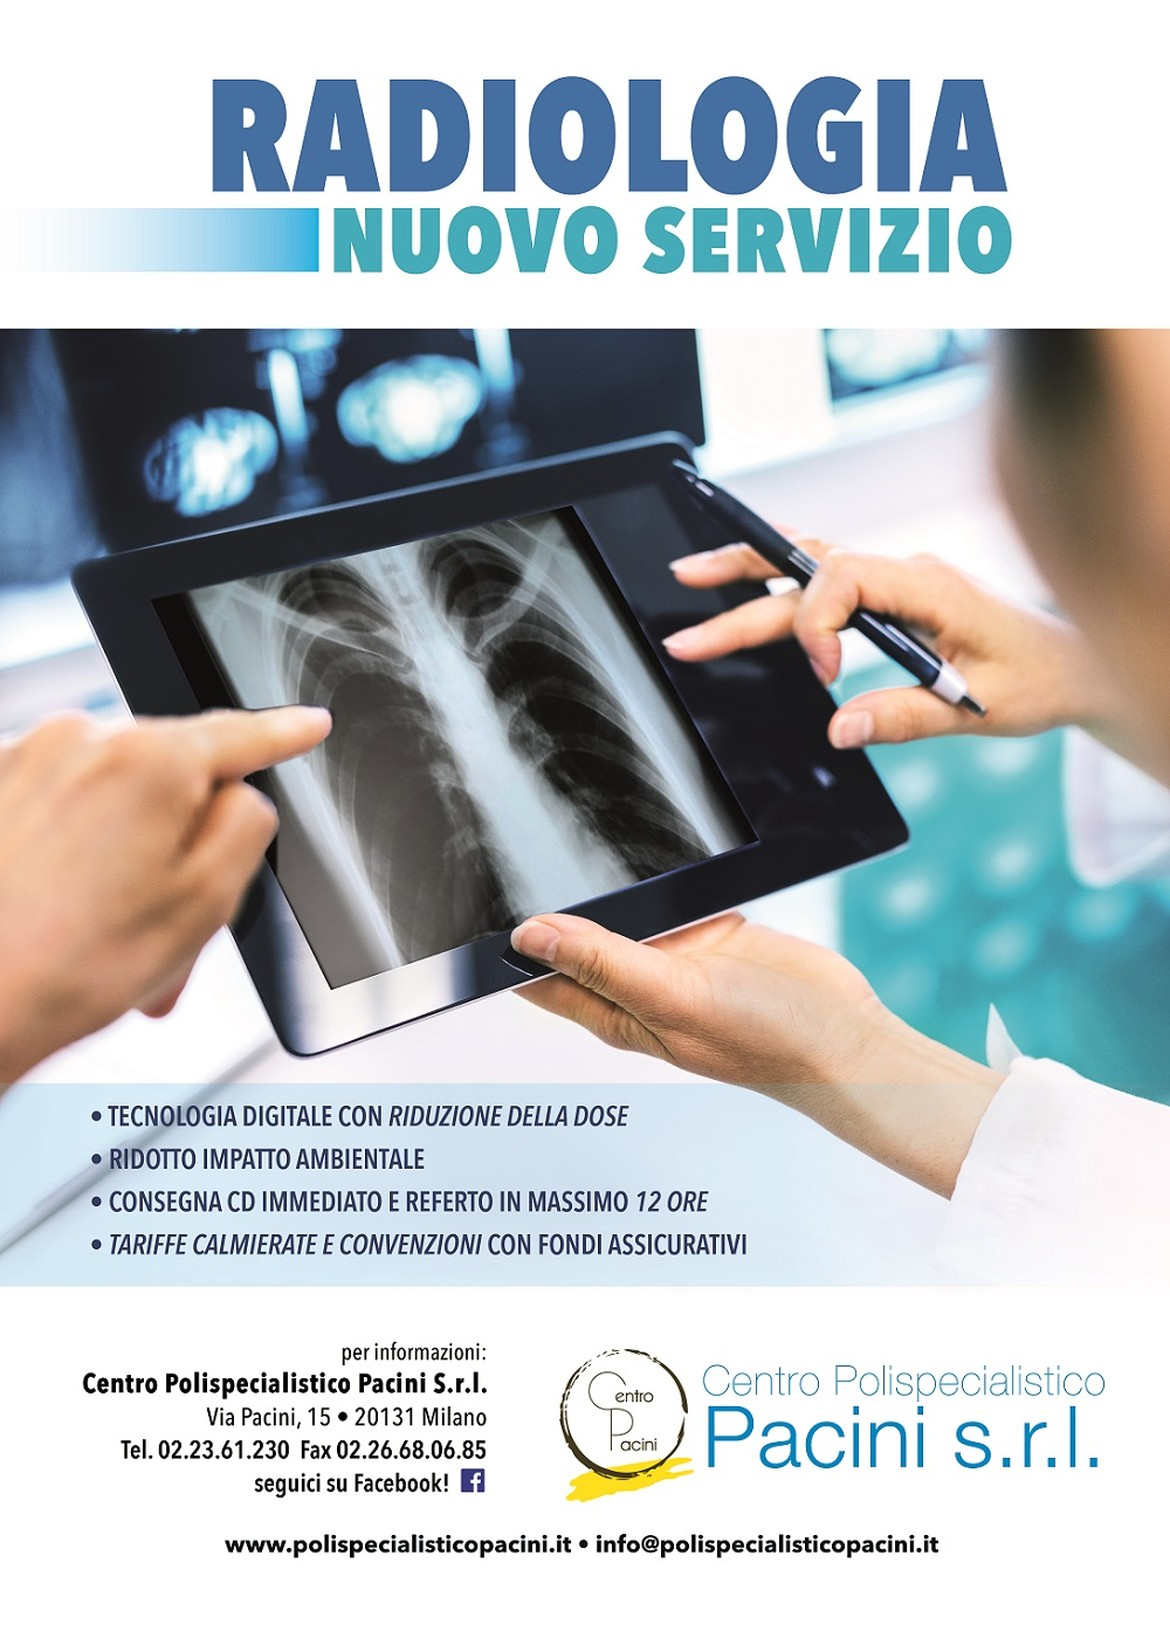 radiologia-nuovo-servizio-03c.jpg__1170x0_q90_subsampling-2_upscale